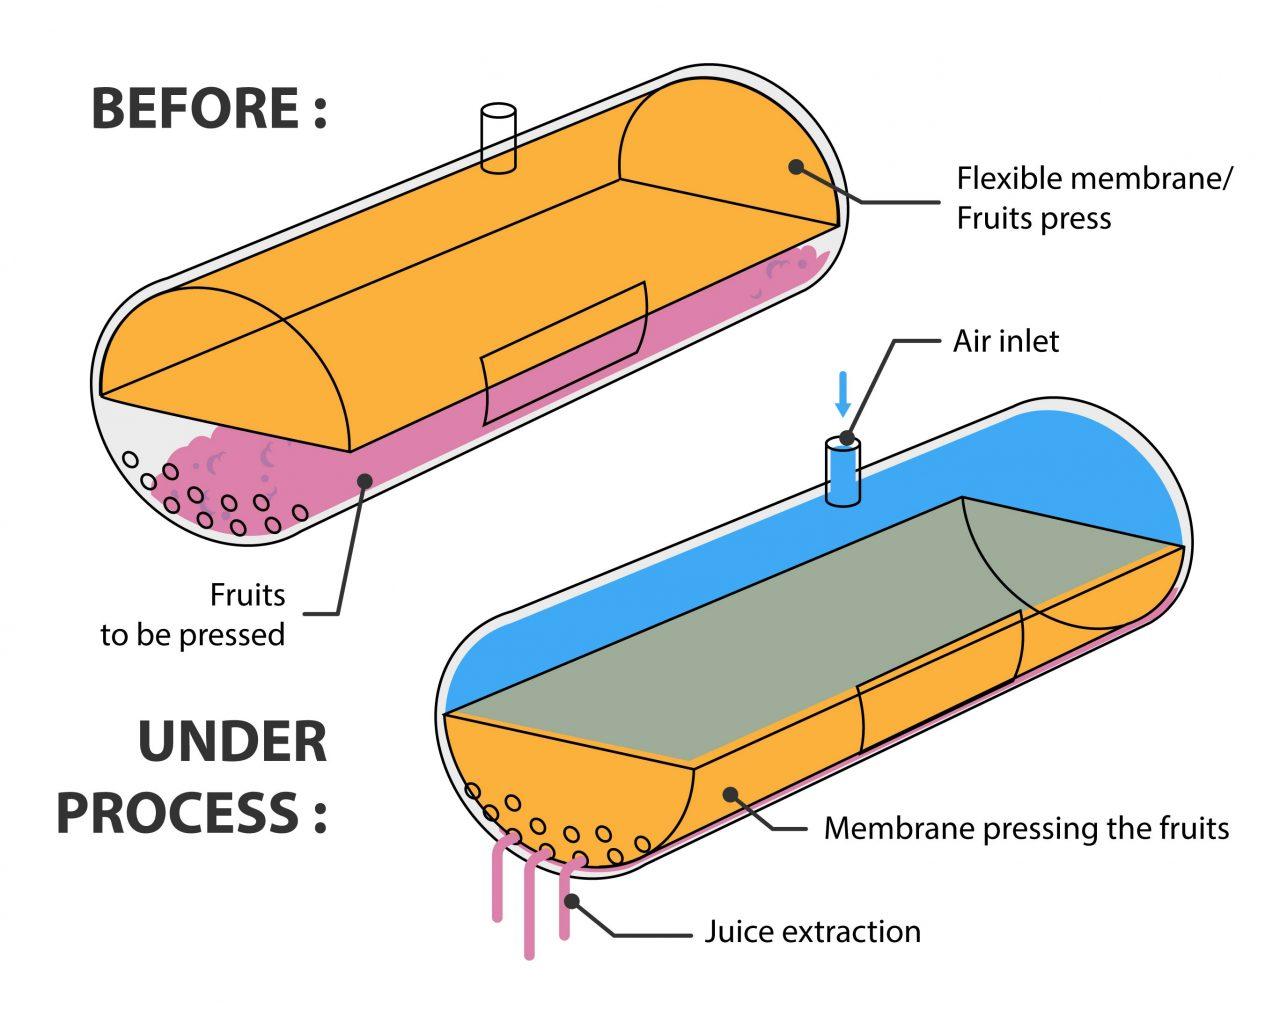 functional scheme about flexible membrane use